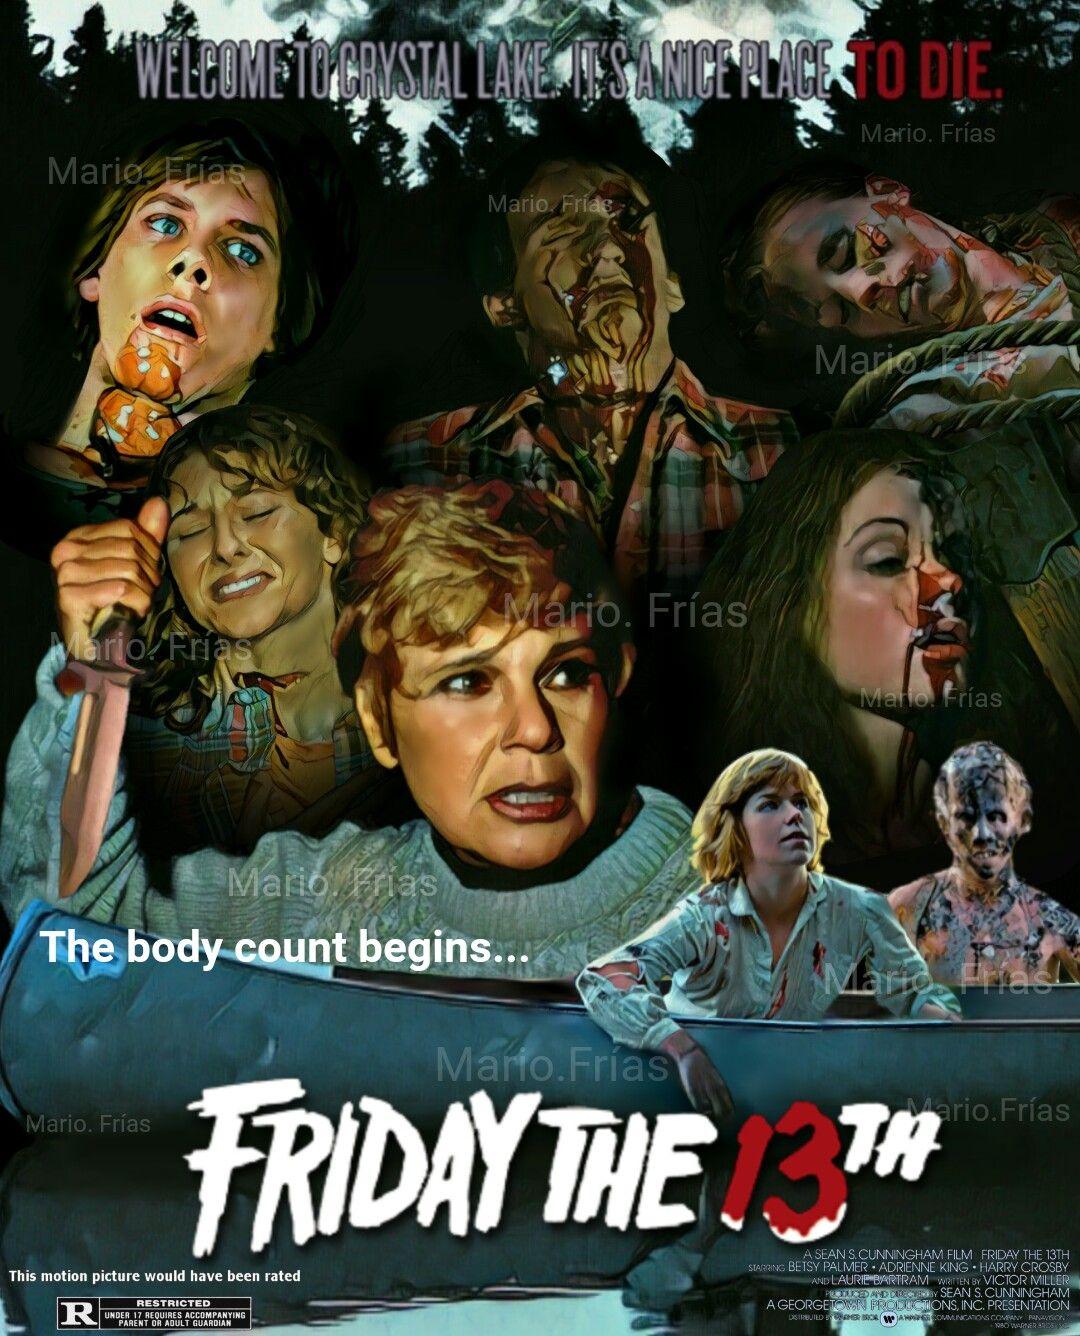 friday the th horror movie slasher fan made edit by mario friday the 13th 1980 horror movie slasher fan made edit by mario friacuteas